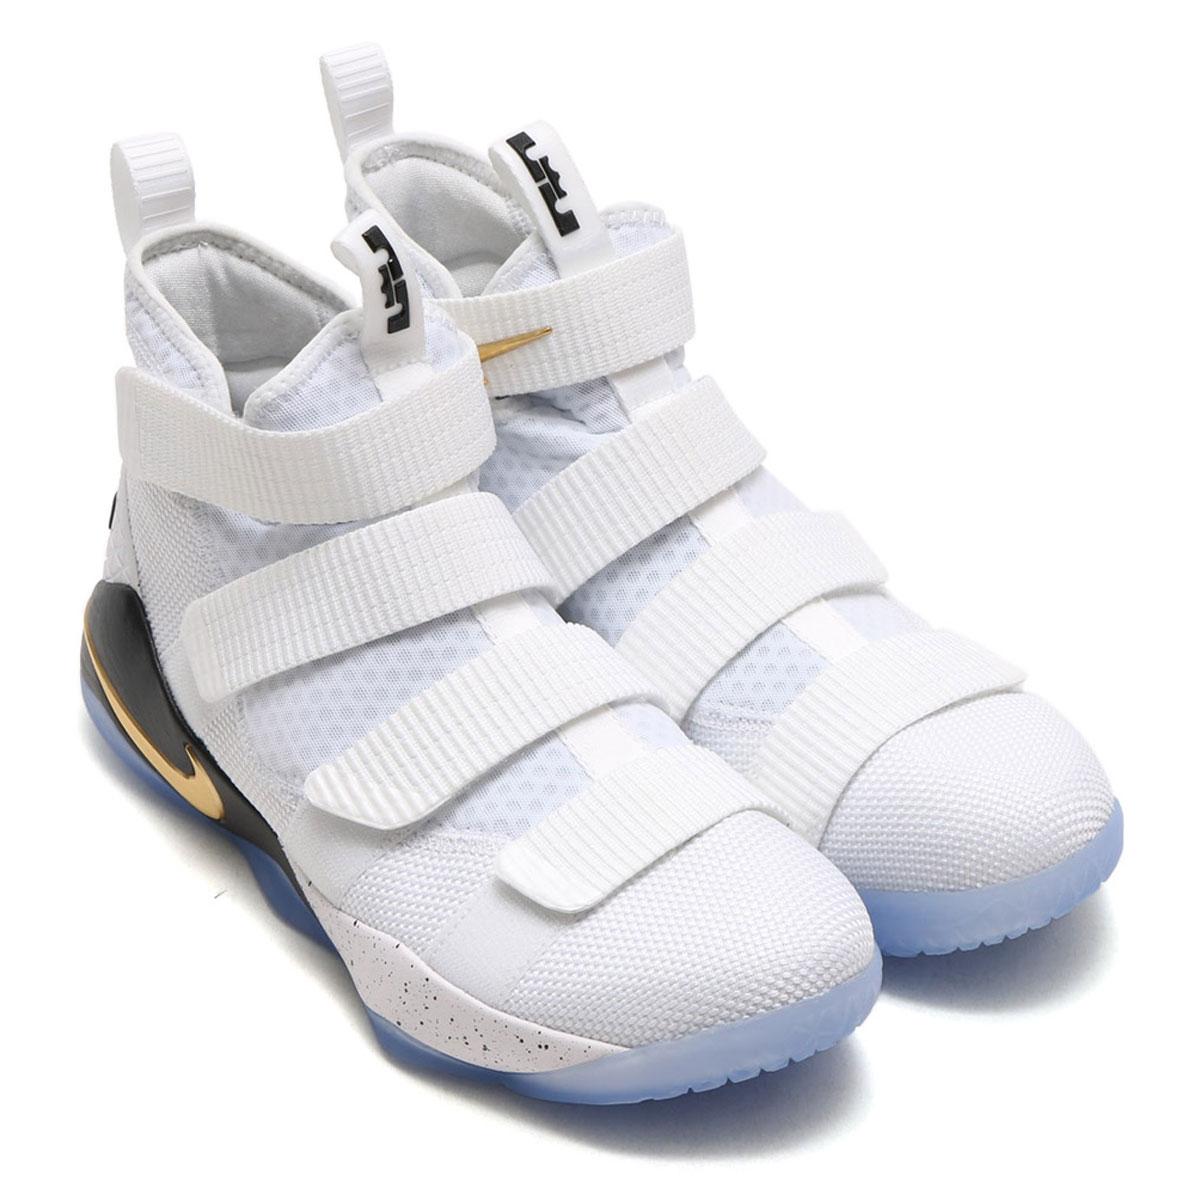 sports shoes a60a4 3fe90 NIKE LEBRON SOLDIER XI EP (Nike Revlon soldier 11 EP) WHITE METALLIC  GOLD-BLACK 17FA-S